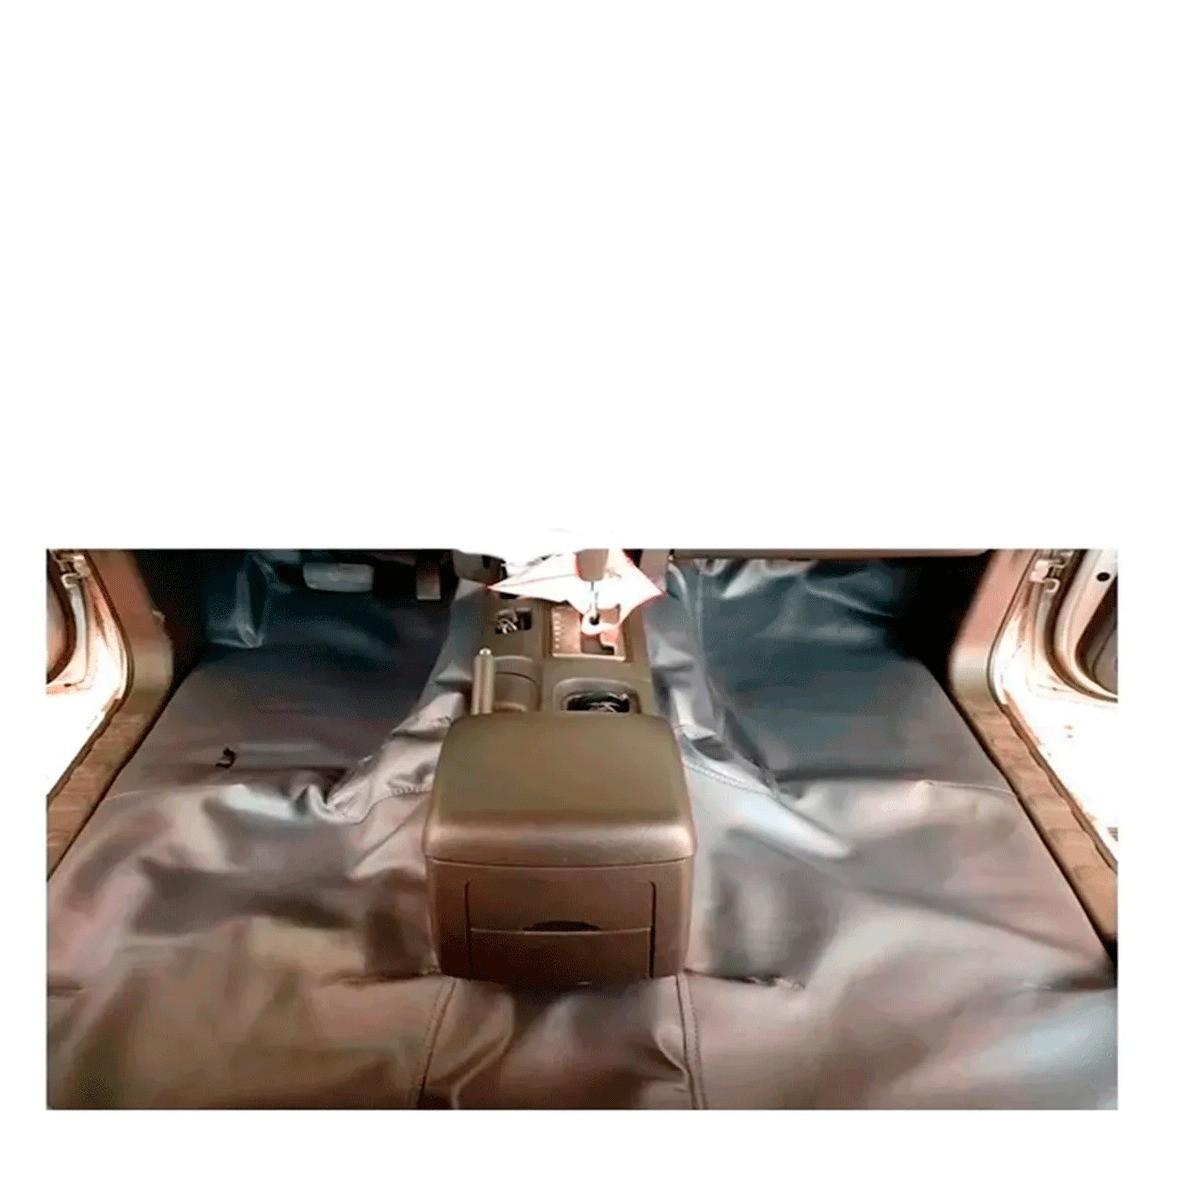 Tapete Automotivo Assoalho Emborrachado Bidim Volkswagen Parati G3 G4 4 PORTAS